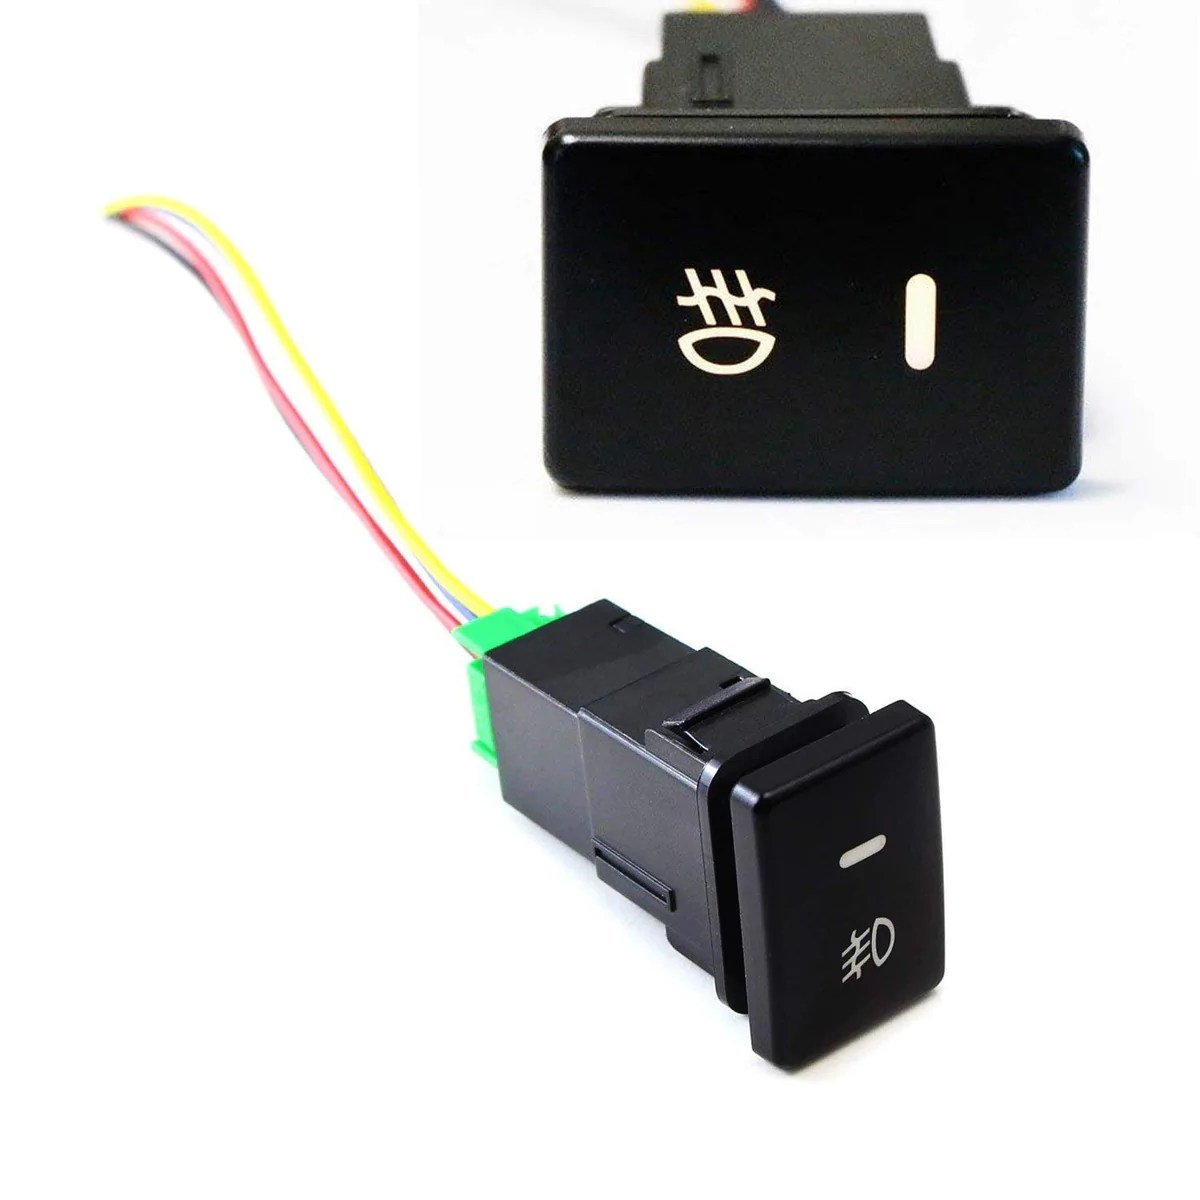 rav aftermarket fog light wiring diagram on aftermarket cigarette lighter diagram hella headlight wiring diagram  [ 1200 x 1200 Pixel ]